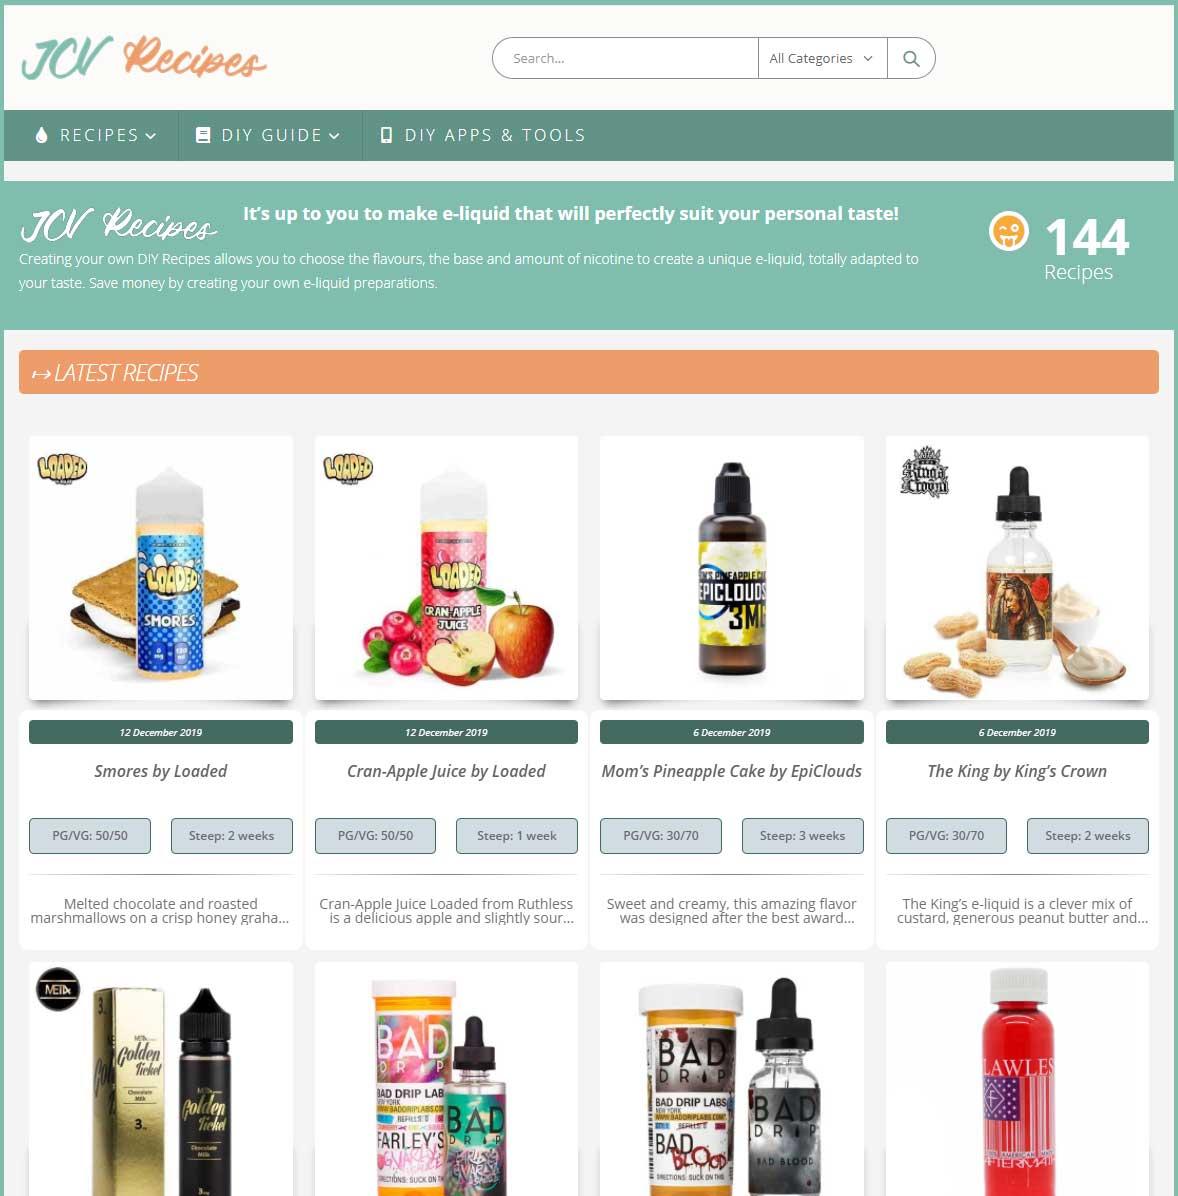 jcv-recipes-site